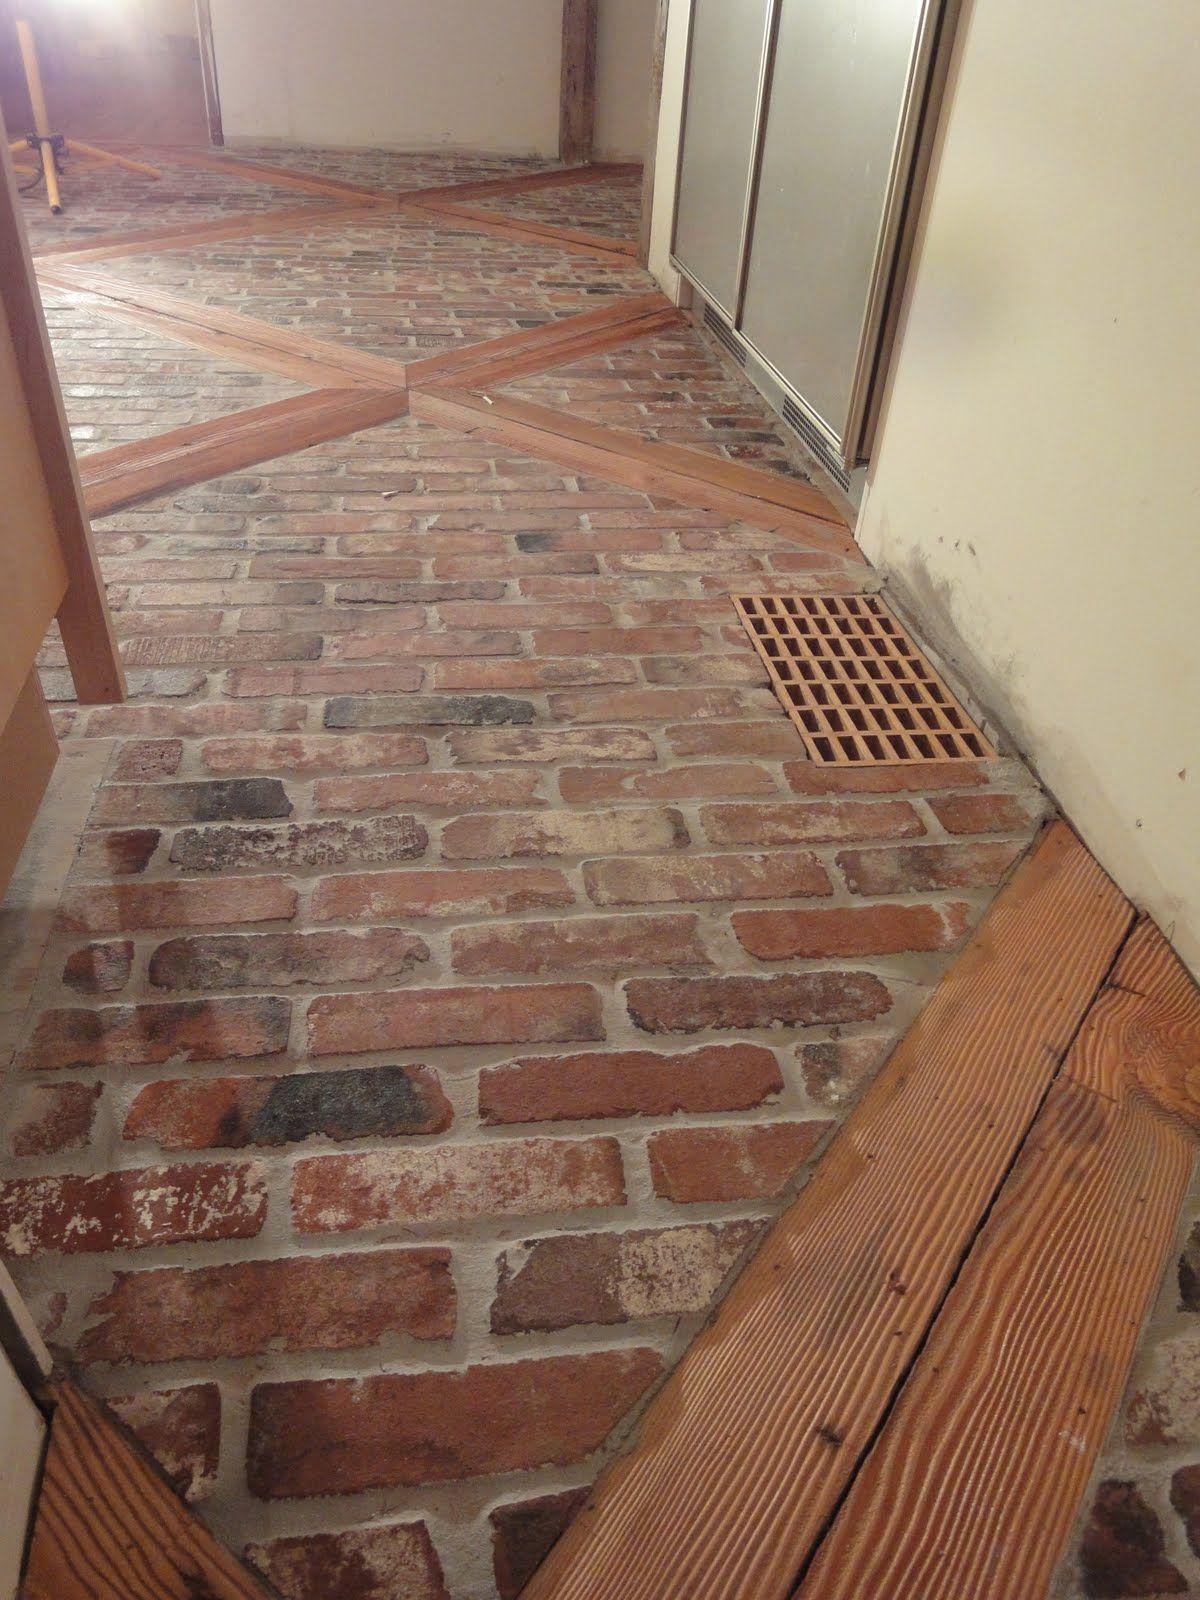 1900 farmhouse kitchen floor b b ideas for next door pinterest kitchen floors on farmhouse kitchen flooring id=55146